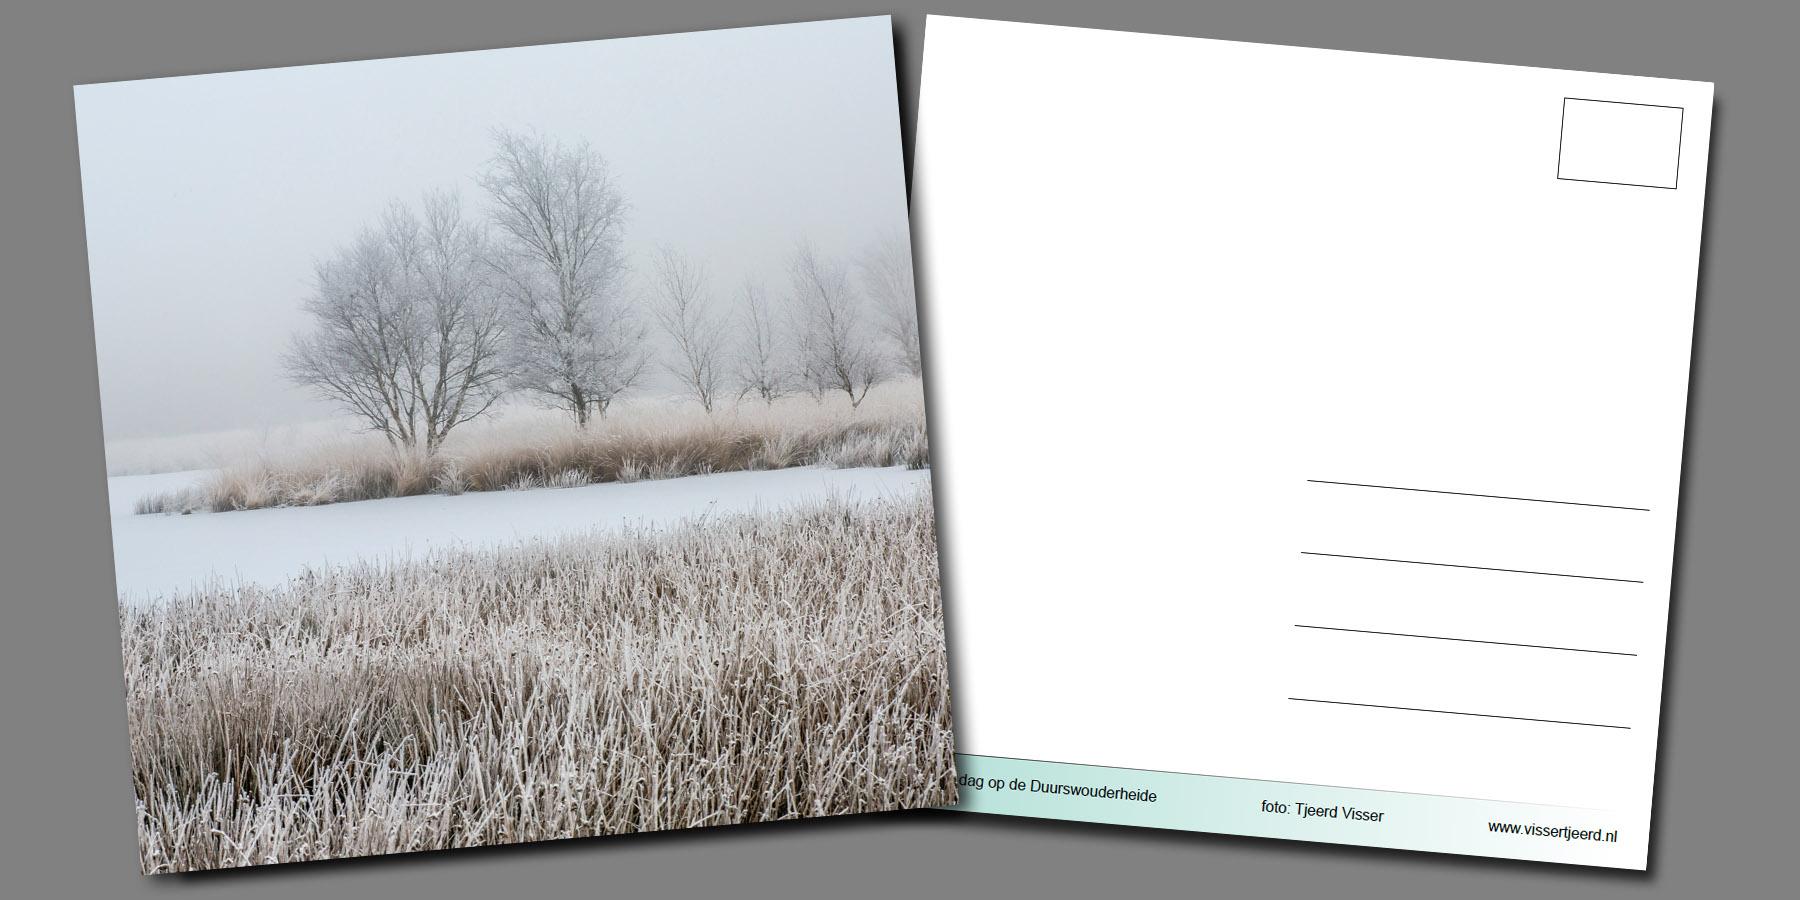 Ansichtkaart_Tjeerd_Visser_winter